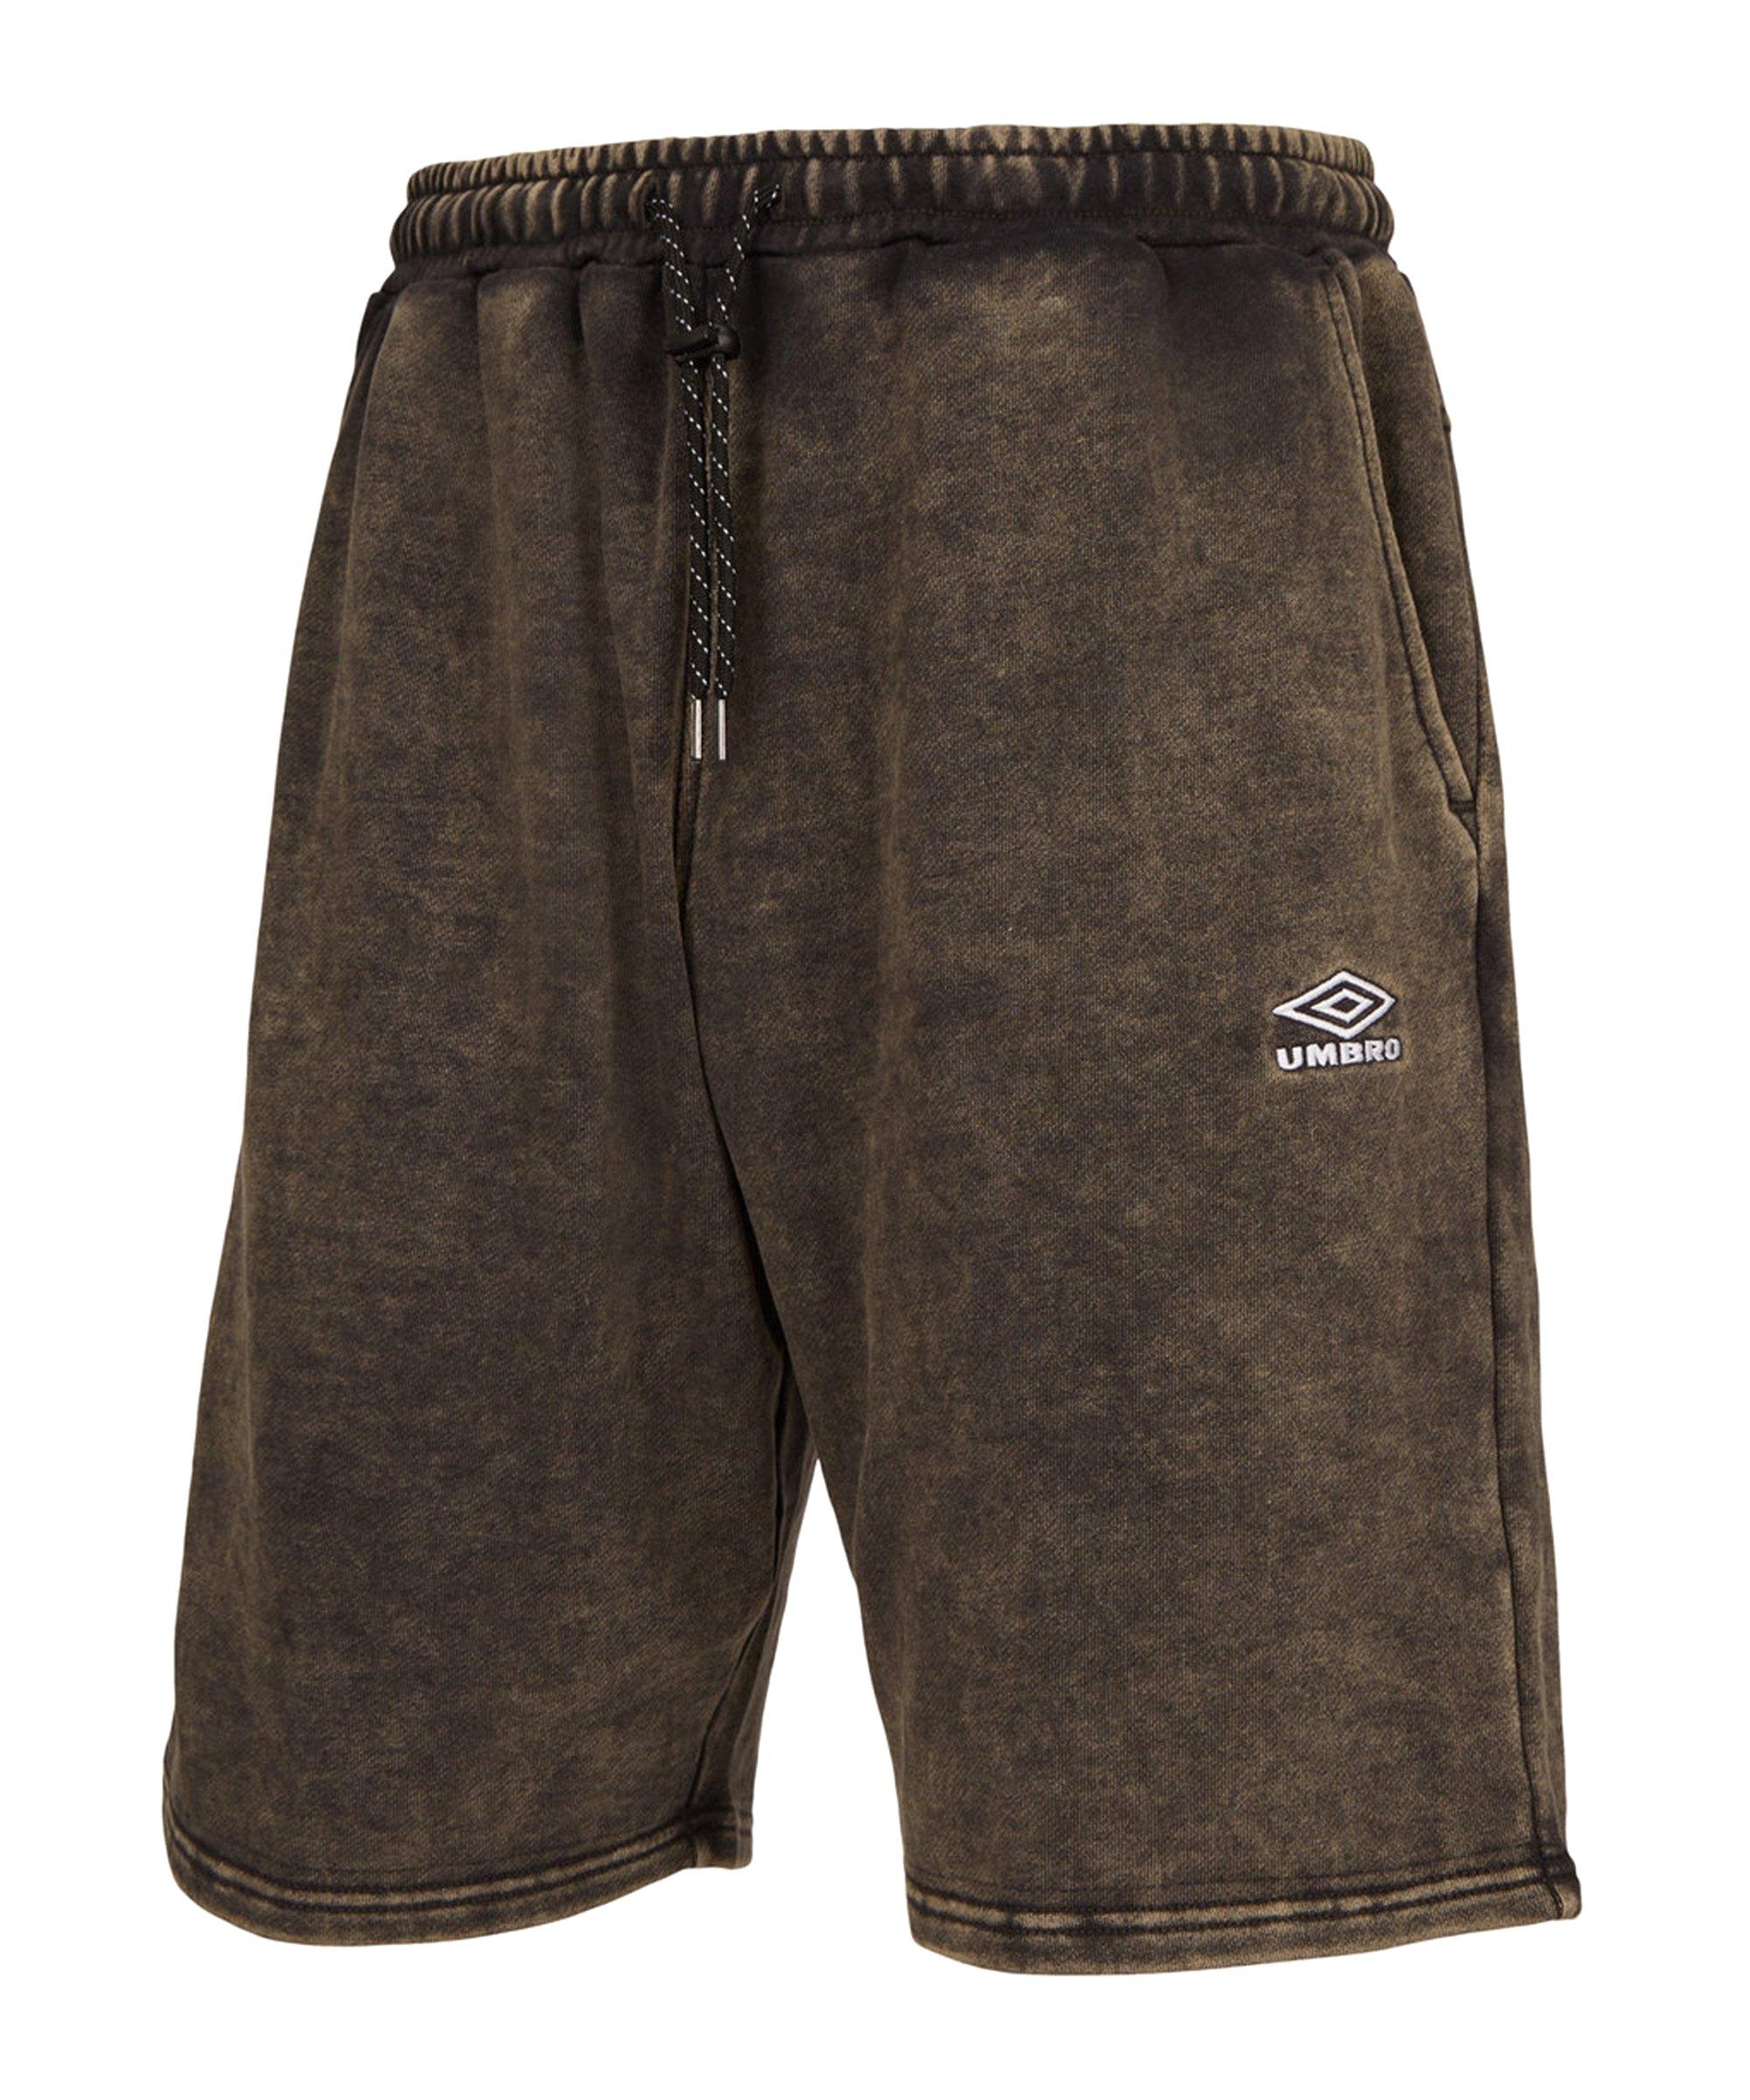 Umbro Washed Knee Length Short Schwarz F60 - schwarz